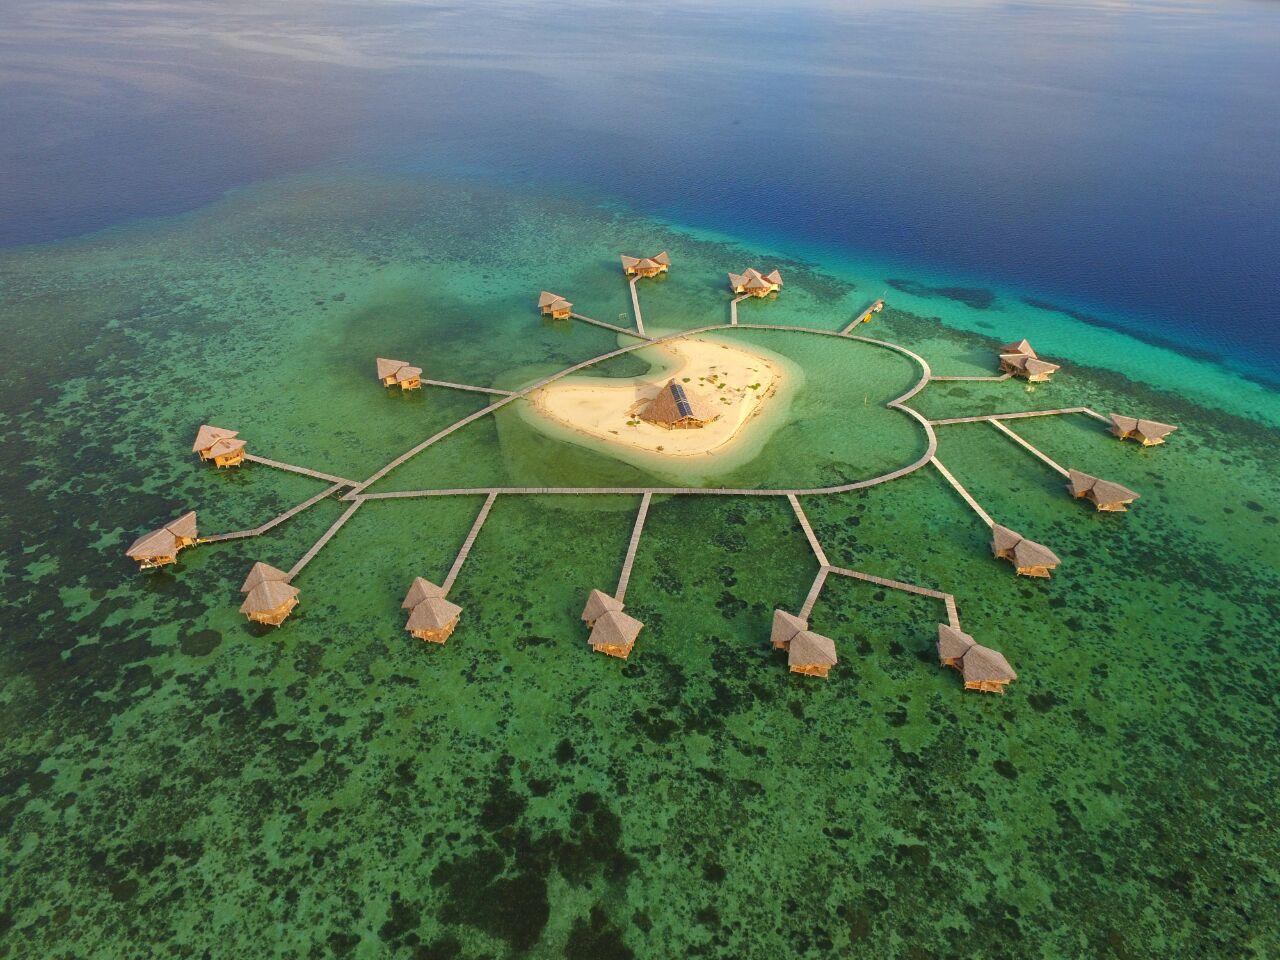 20 Tempat Wisata Gorontalo Utara Bagus Wajib Dikunjungi Pulau Cinta